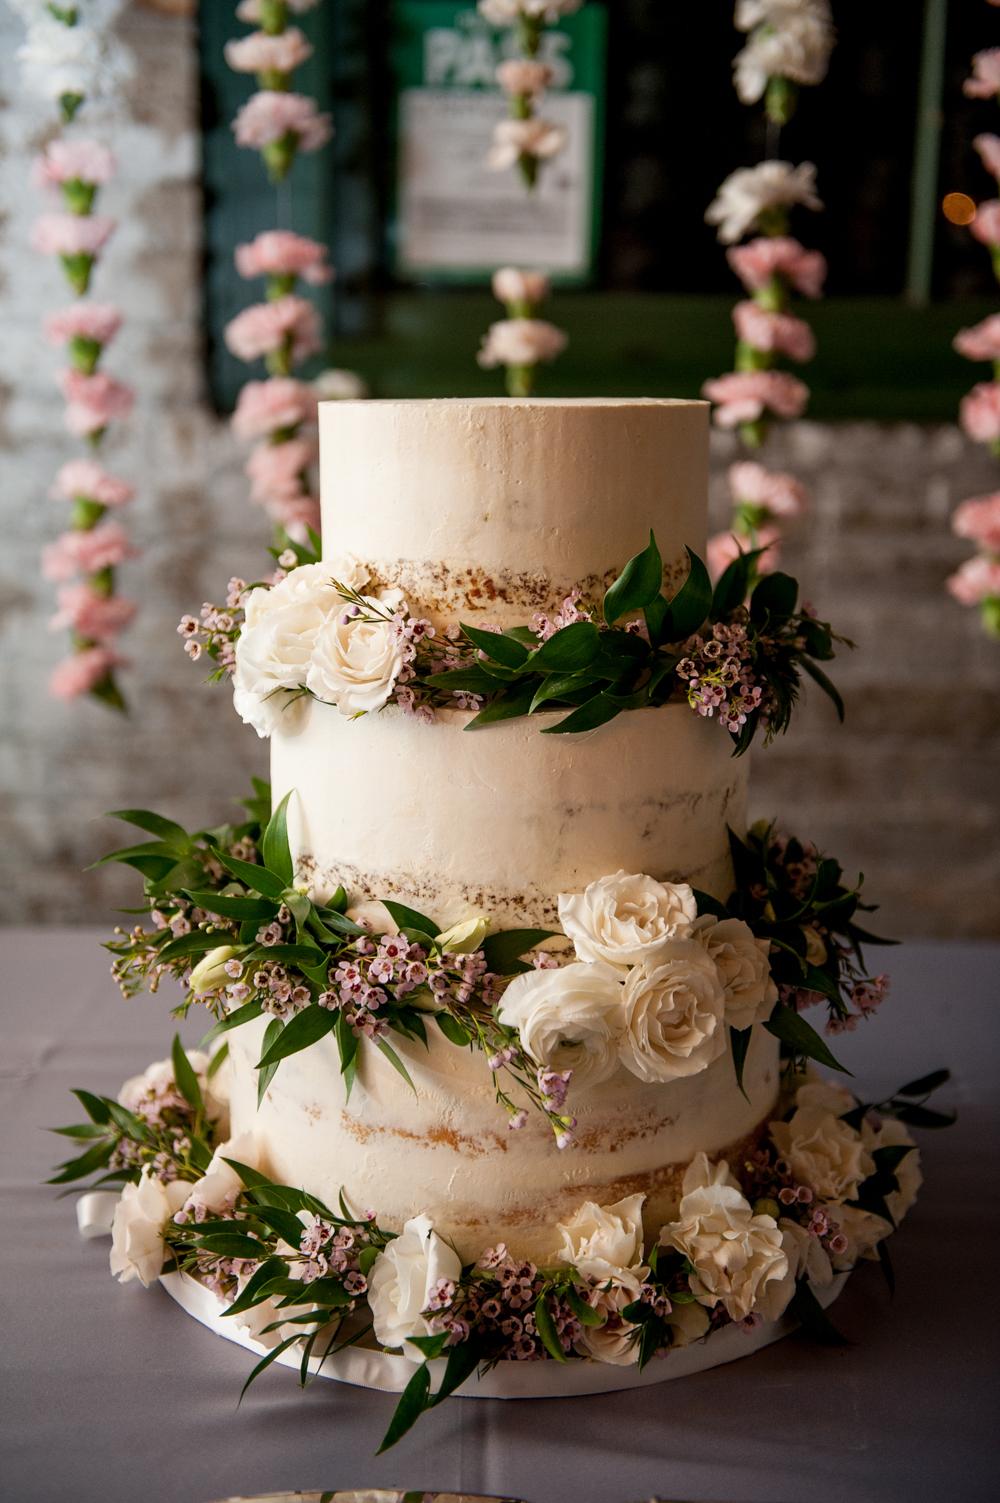 kjandco_balzacs_wedding_rec995.jpg